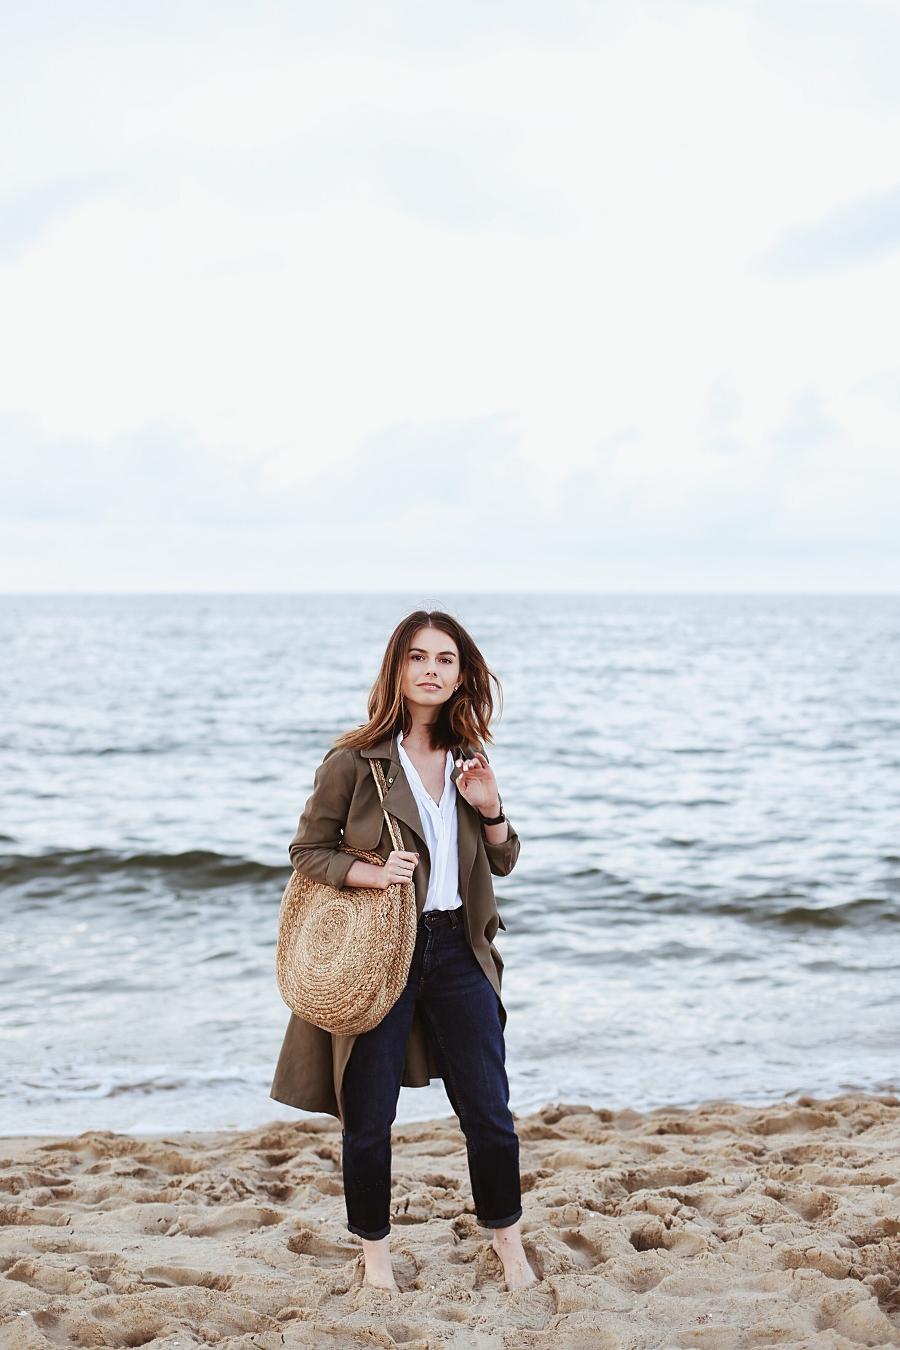 Koszula second hand, mom jeans,trencz, pleciona okrągła torba - sesja na plaży